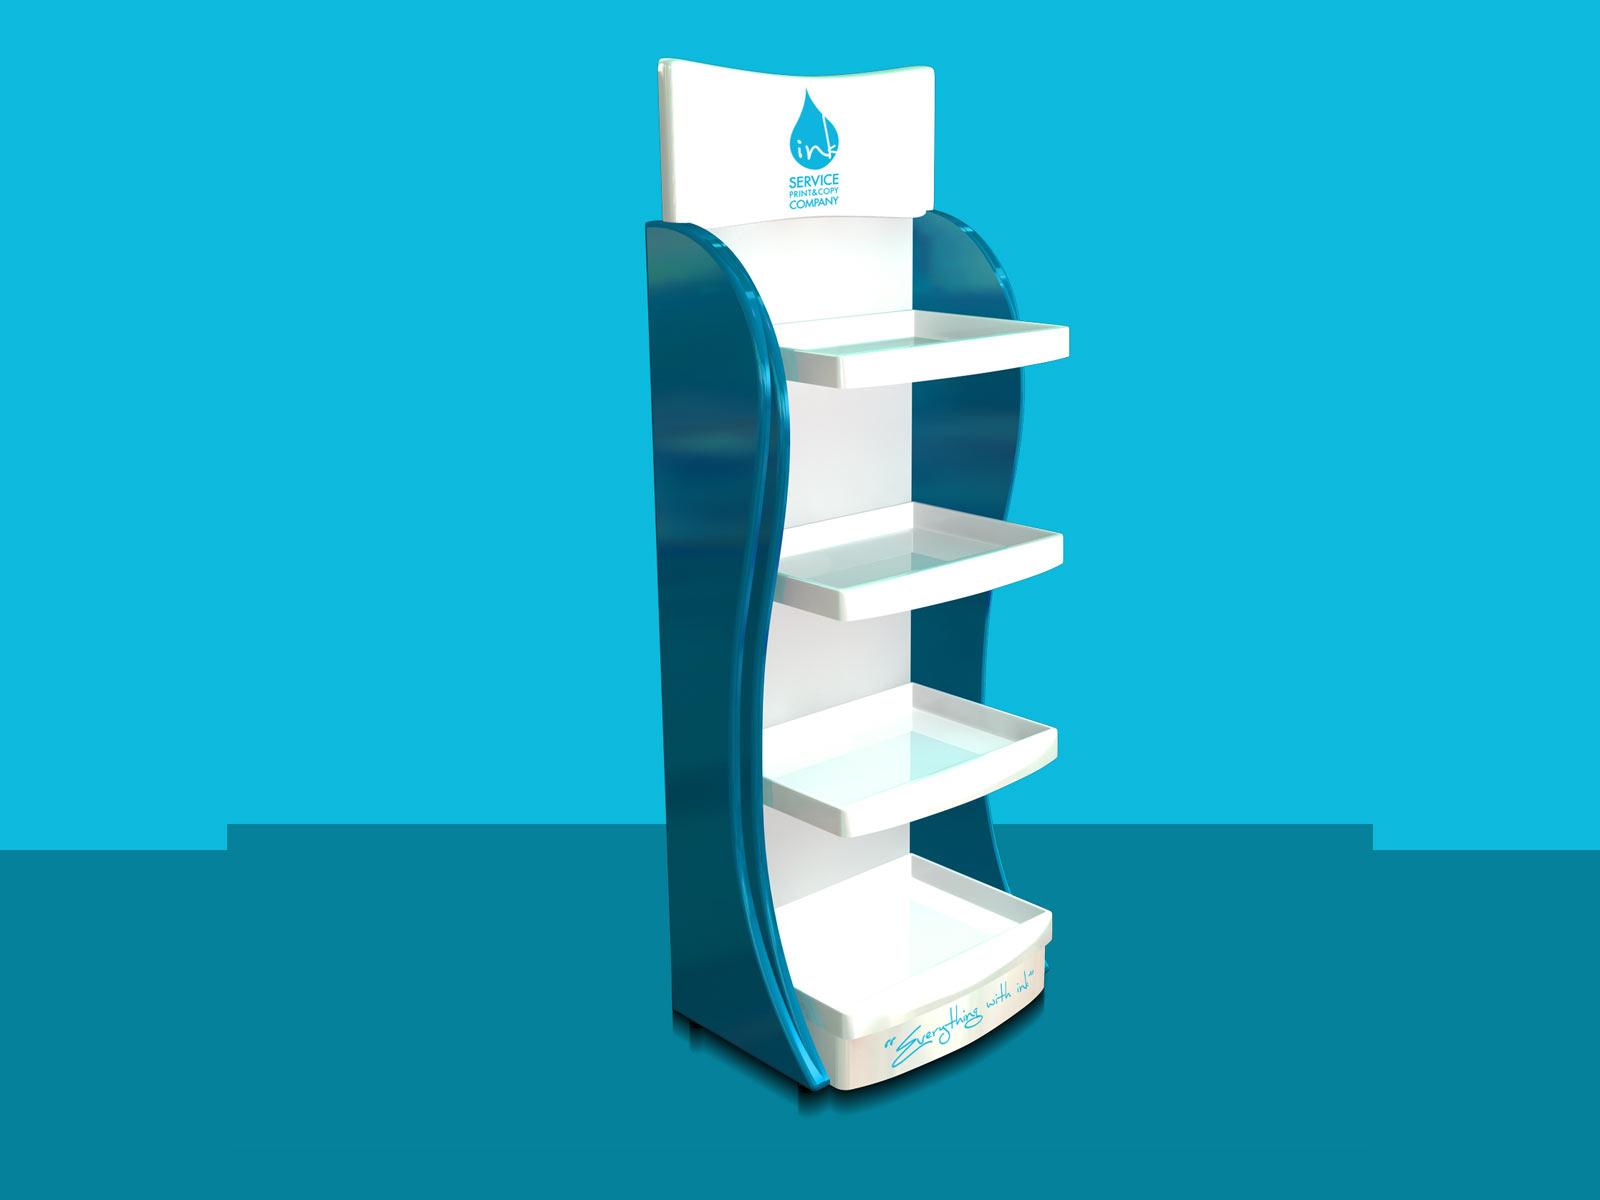 Productstand_04_inkservice-kuwait